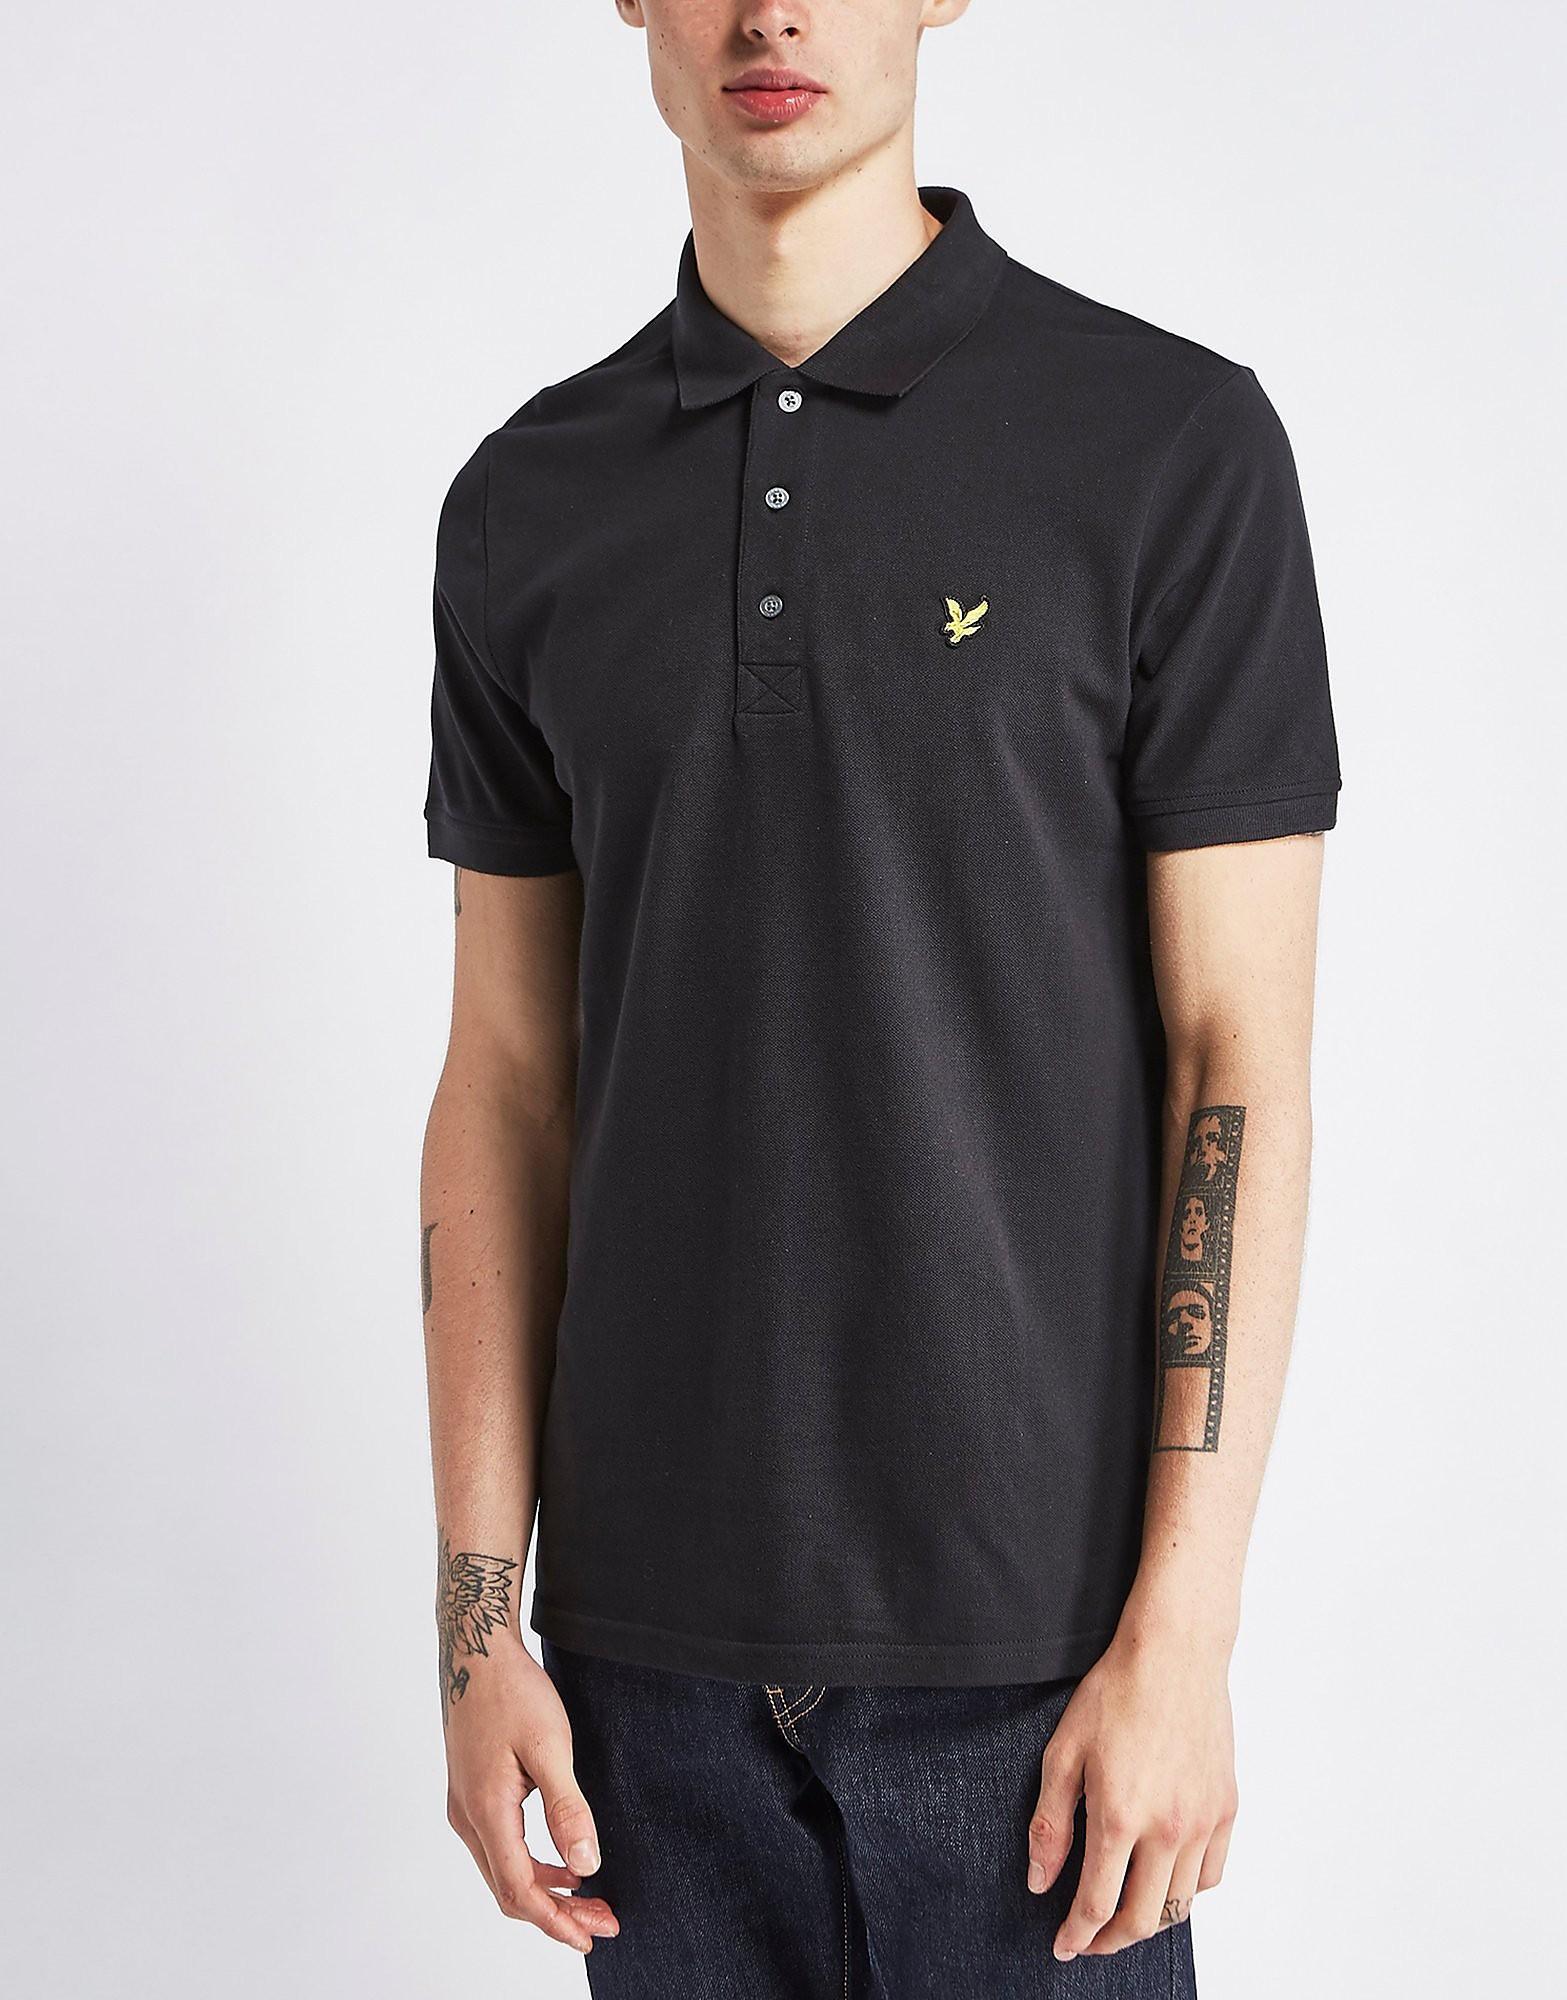 Lyle & Scott Pique Short Sleeve Polo Shirt